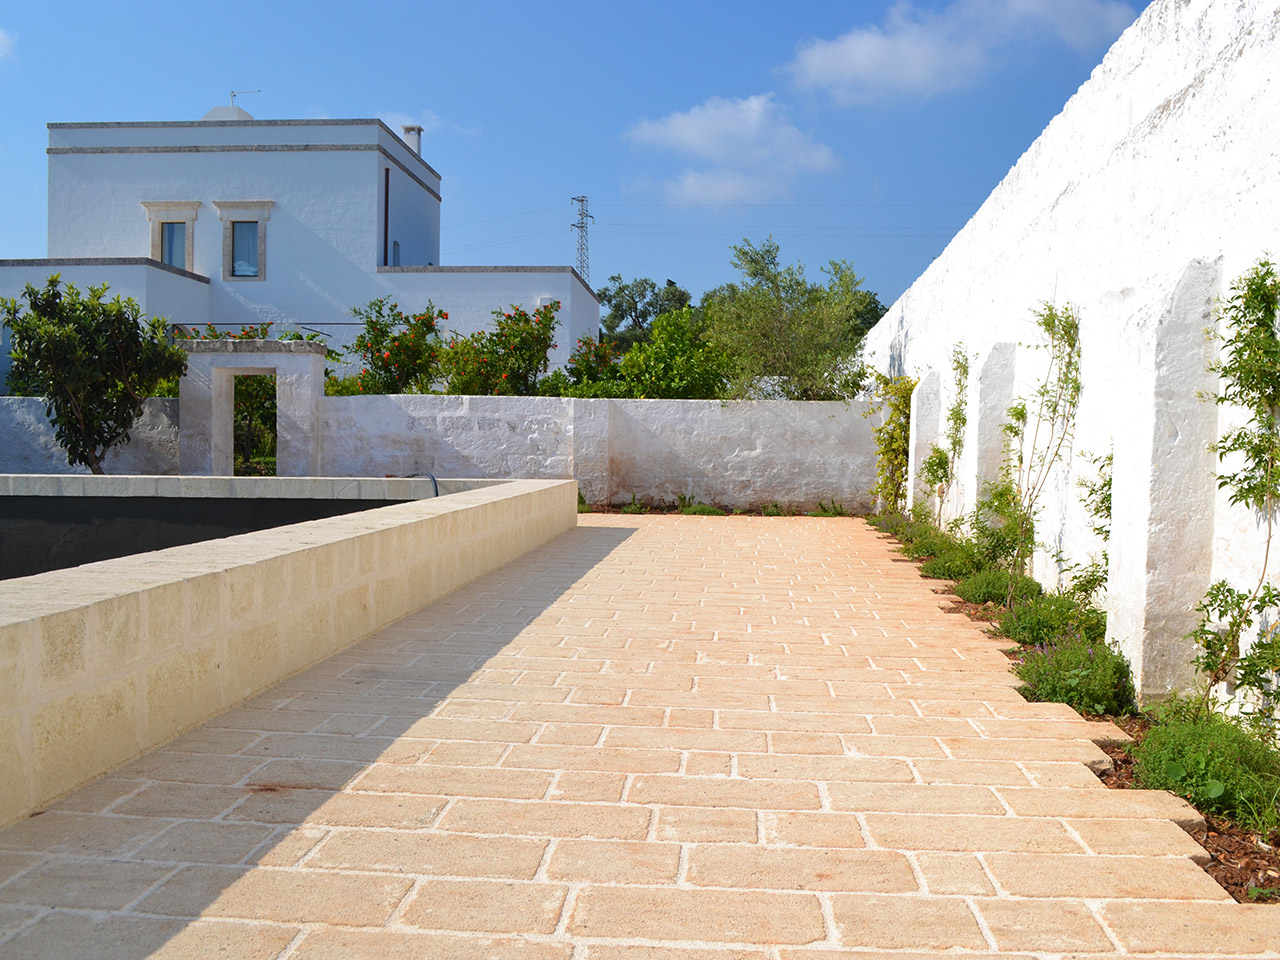 costruzioni restauri sirio ostuni restauro ristrutturazione masseria olive nardo ostuni dsc 5129